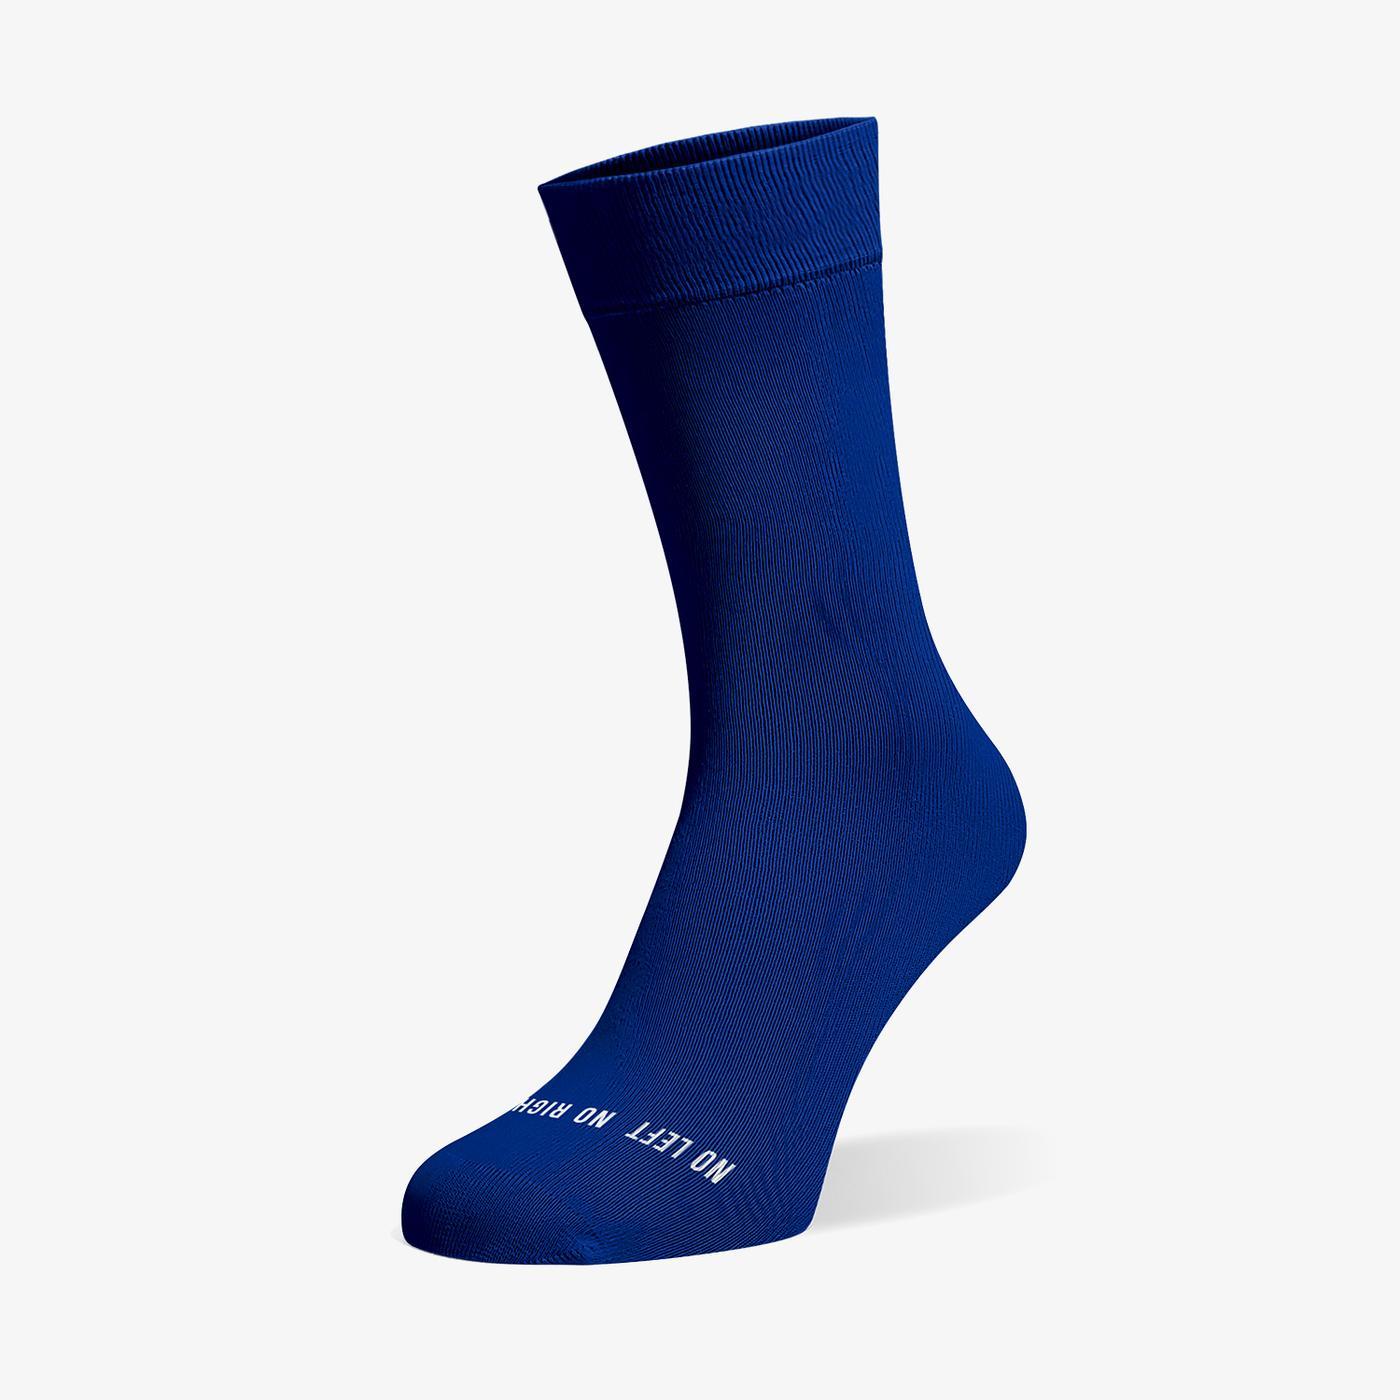 ONESCK Royal Blue One Unisex Mavi Çorap